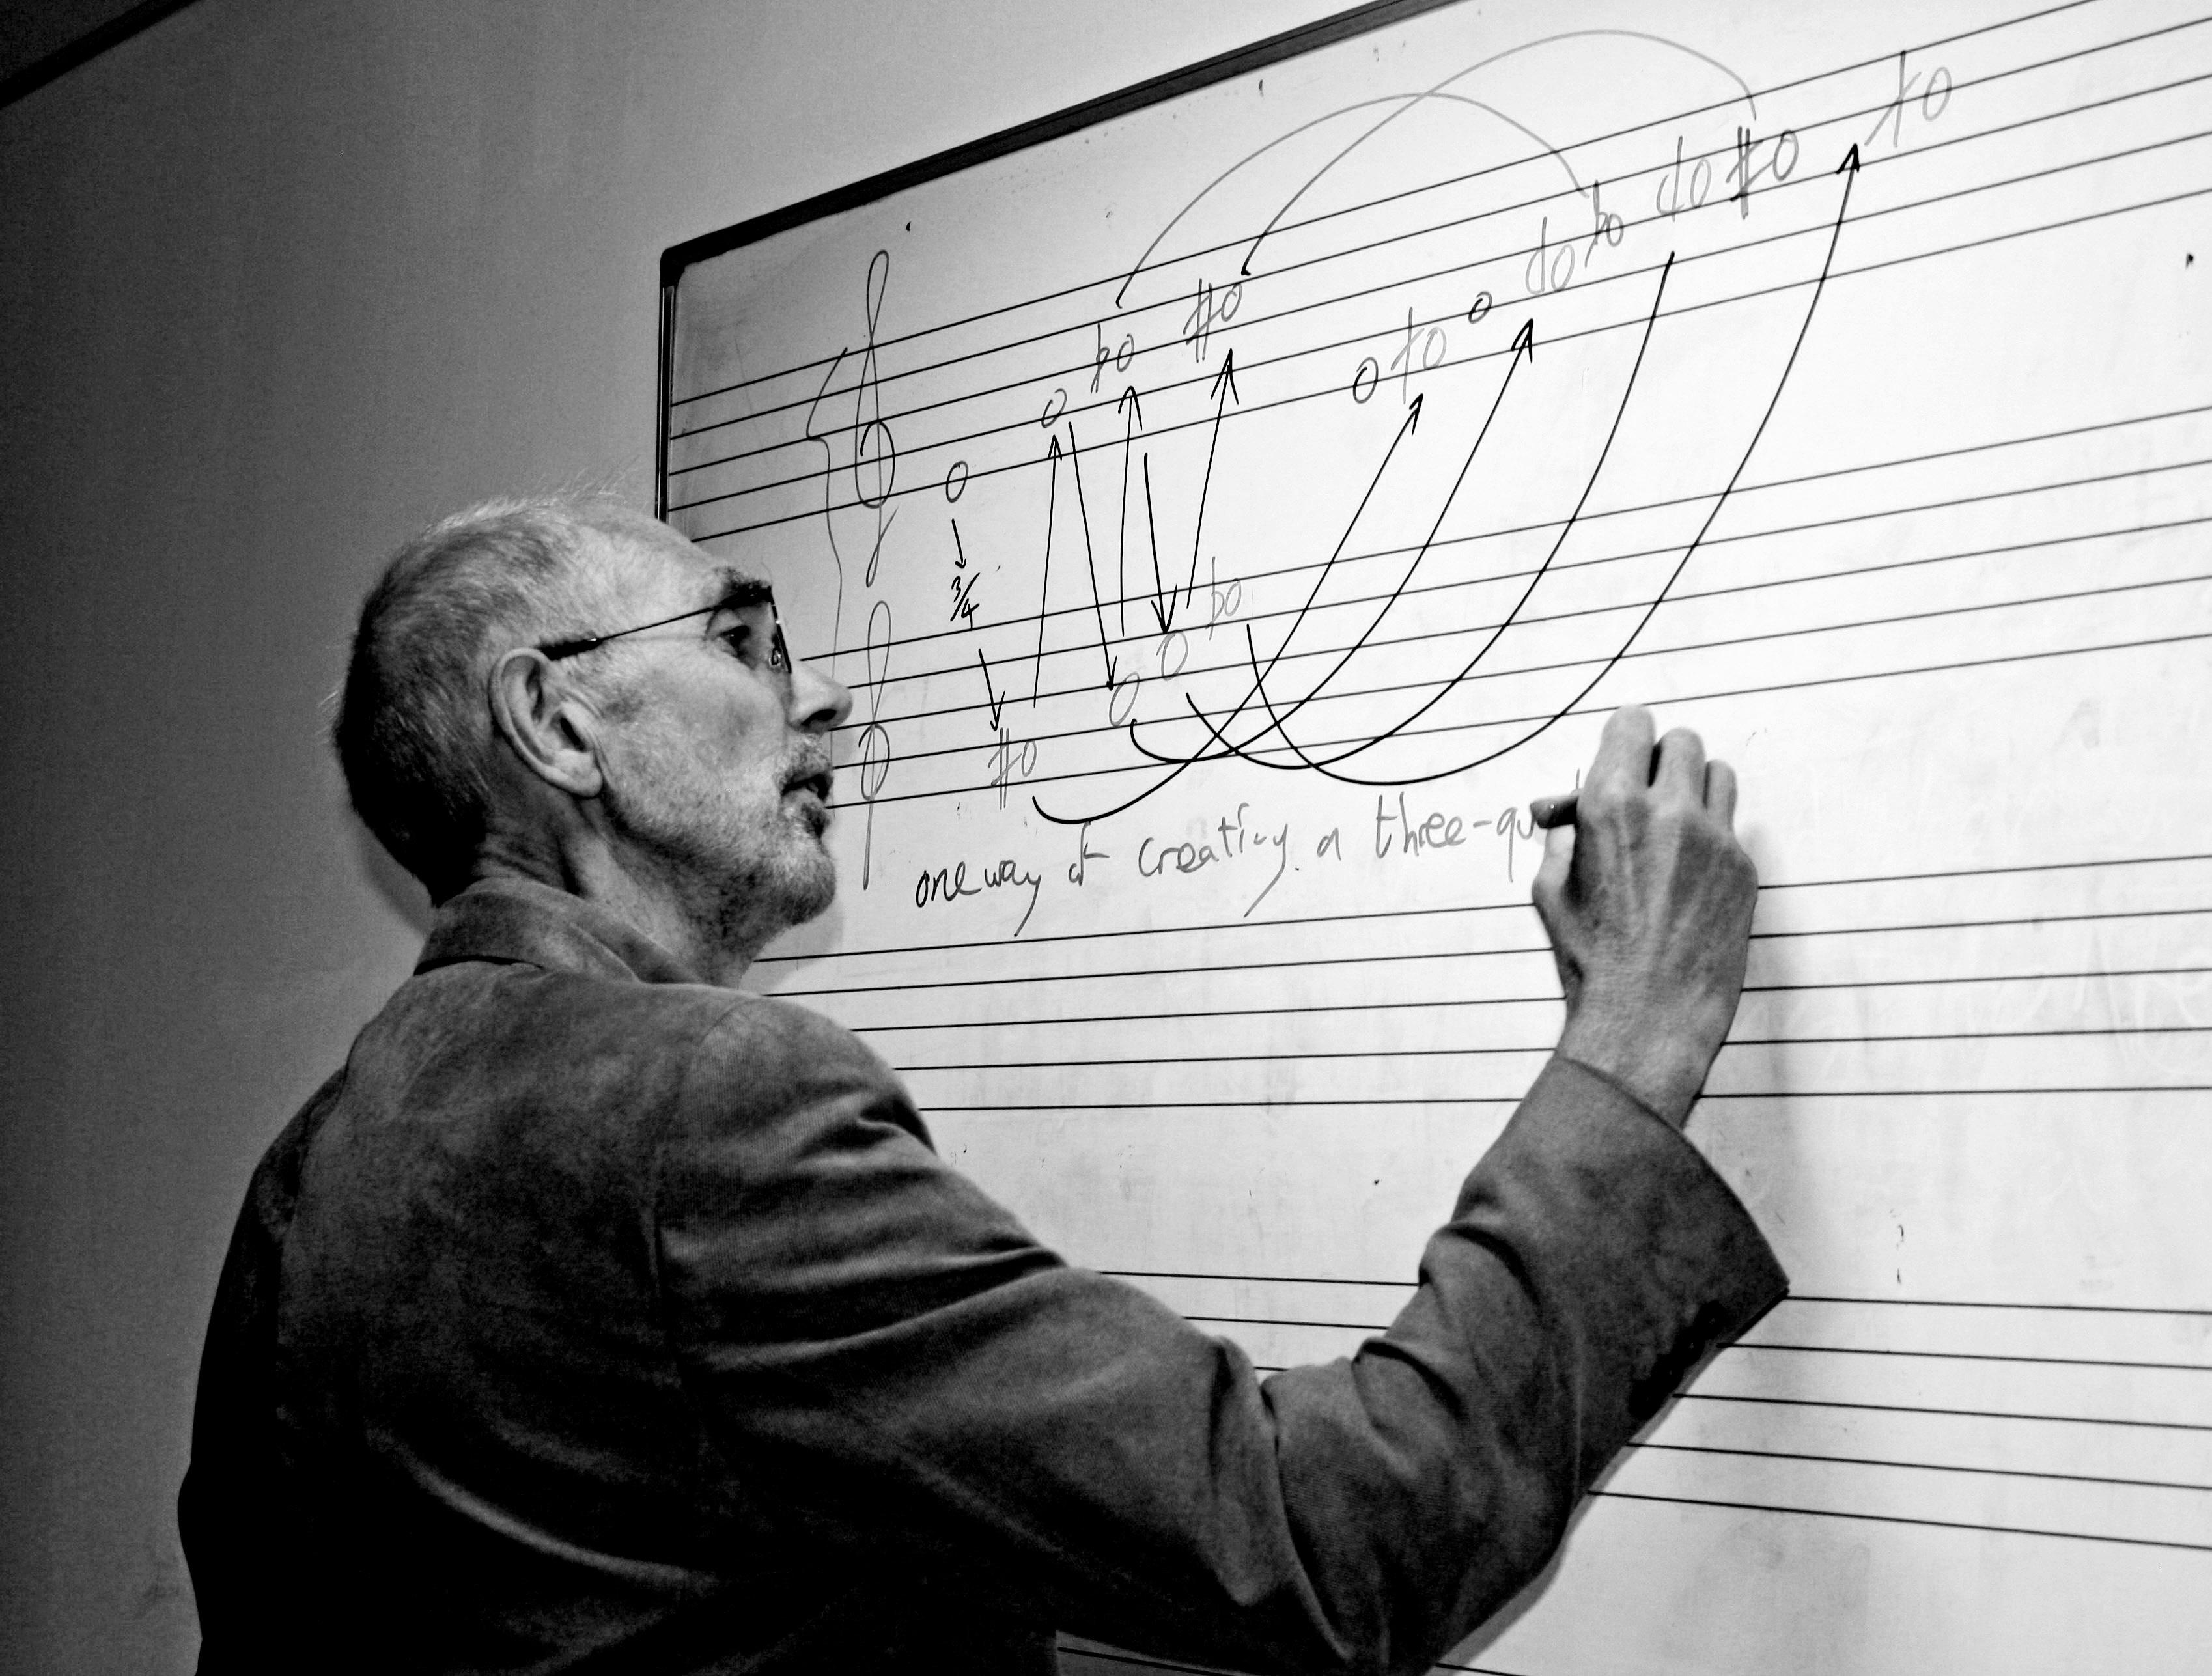 Geoff Palmer teaching music theory